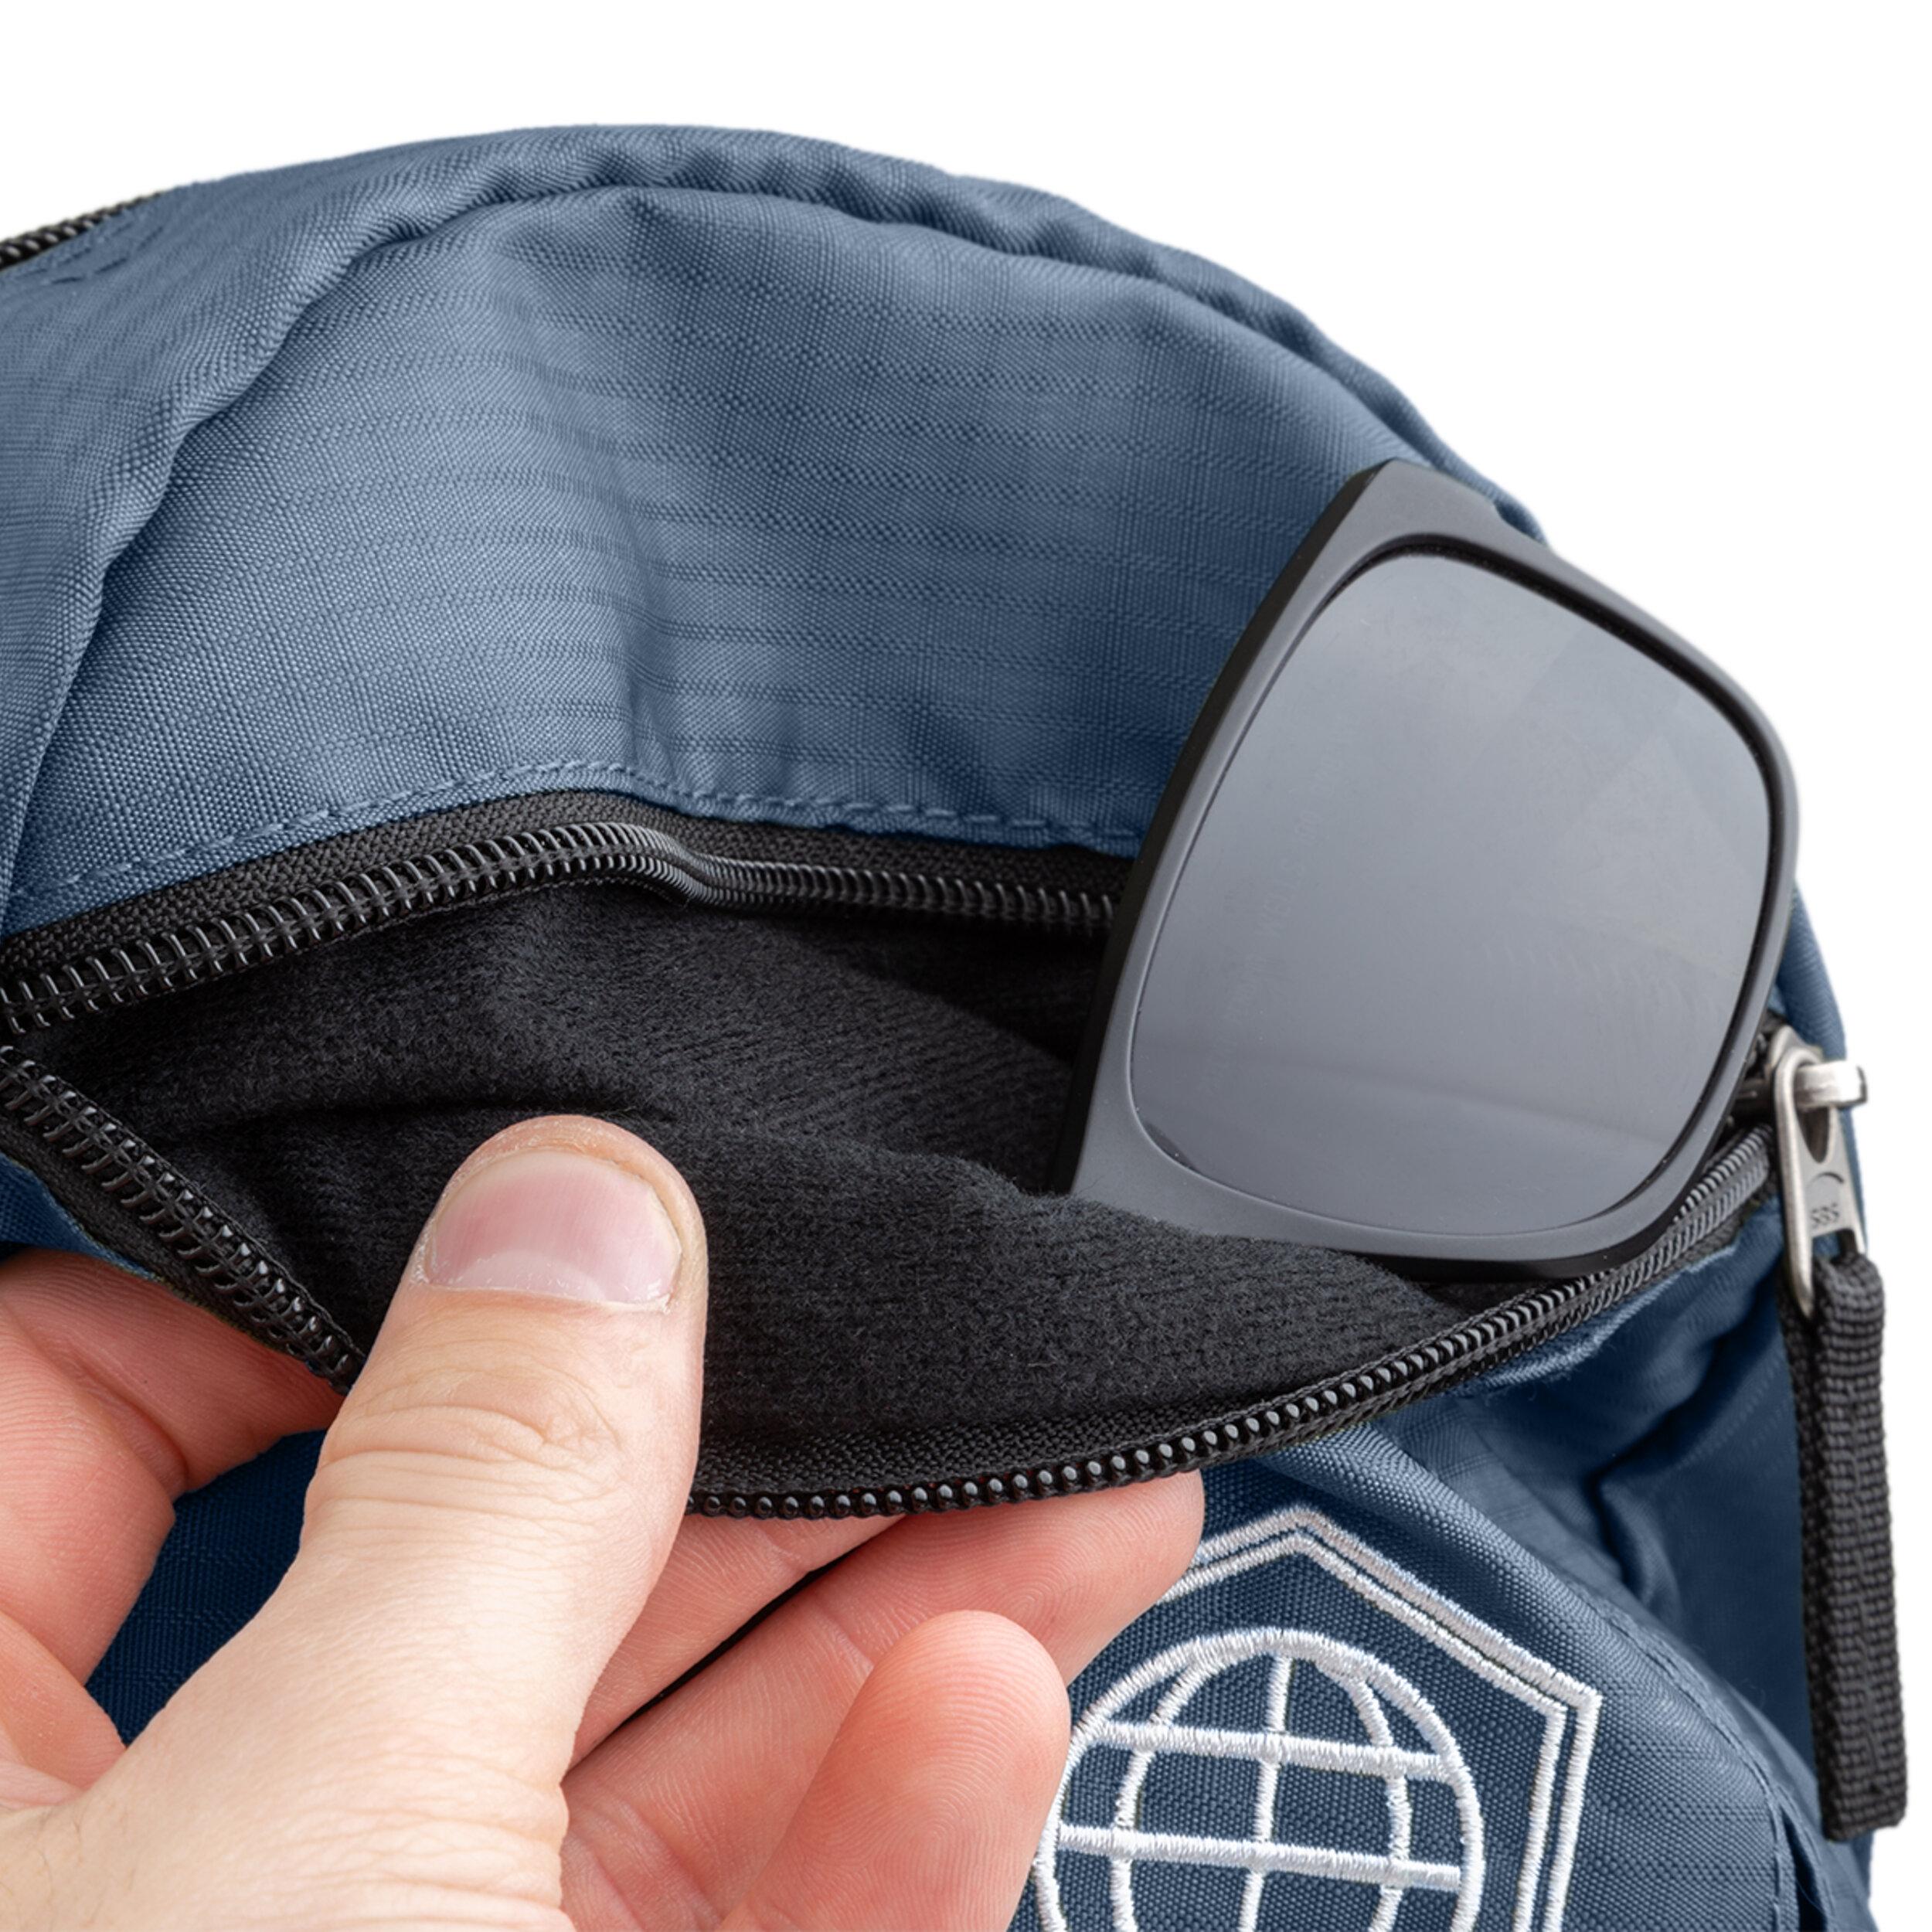 Image 8 - Microfiber Sunglasses Pouch Blue.jpg